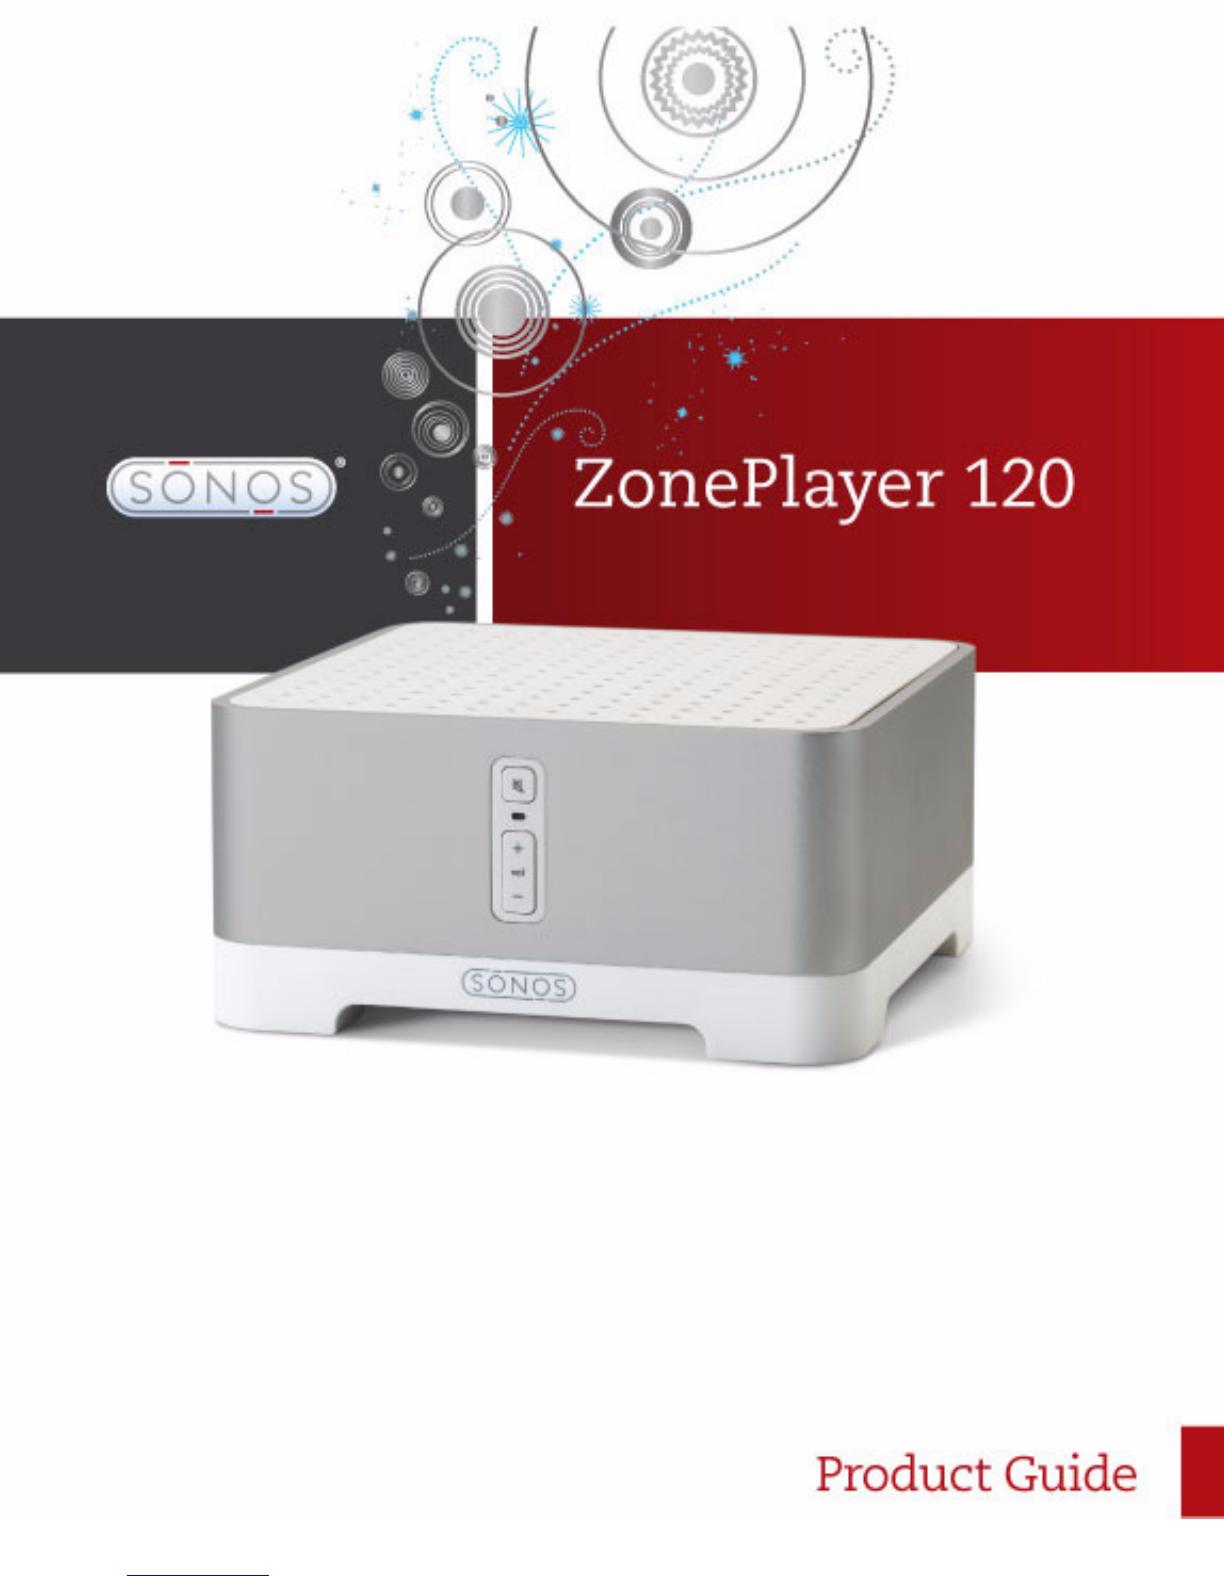 sonos zoneplayer 120 manual rh manualscat com Sonos CD Player Sonos Connect Back